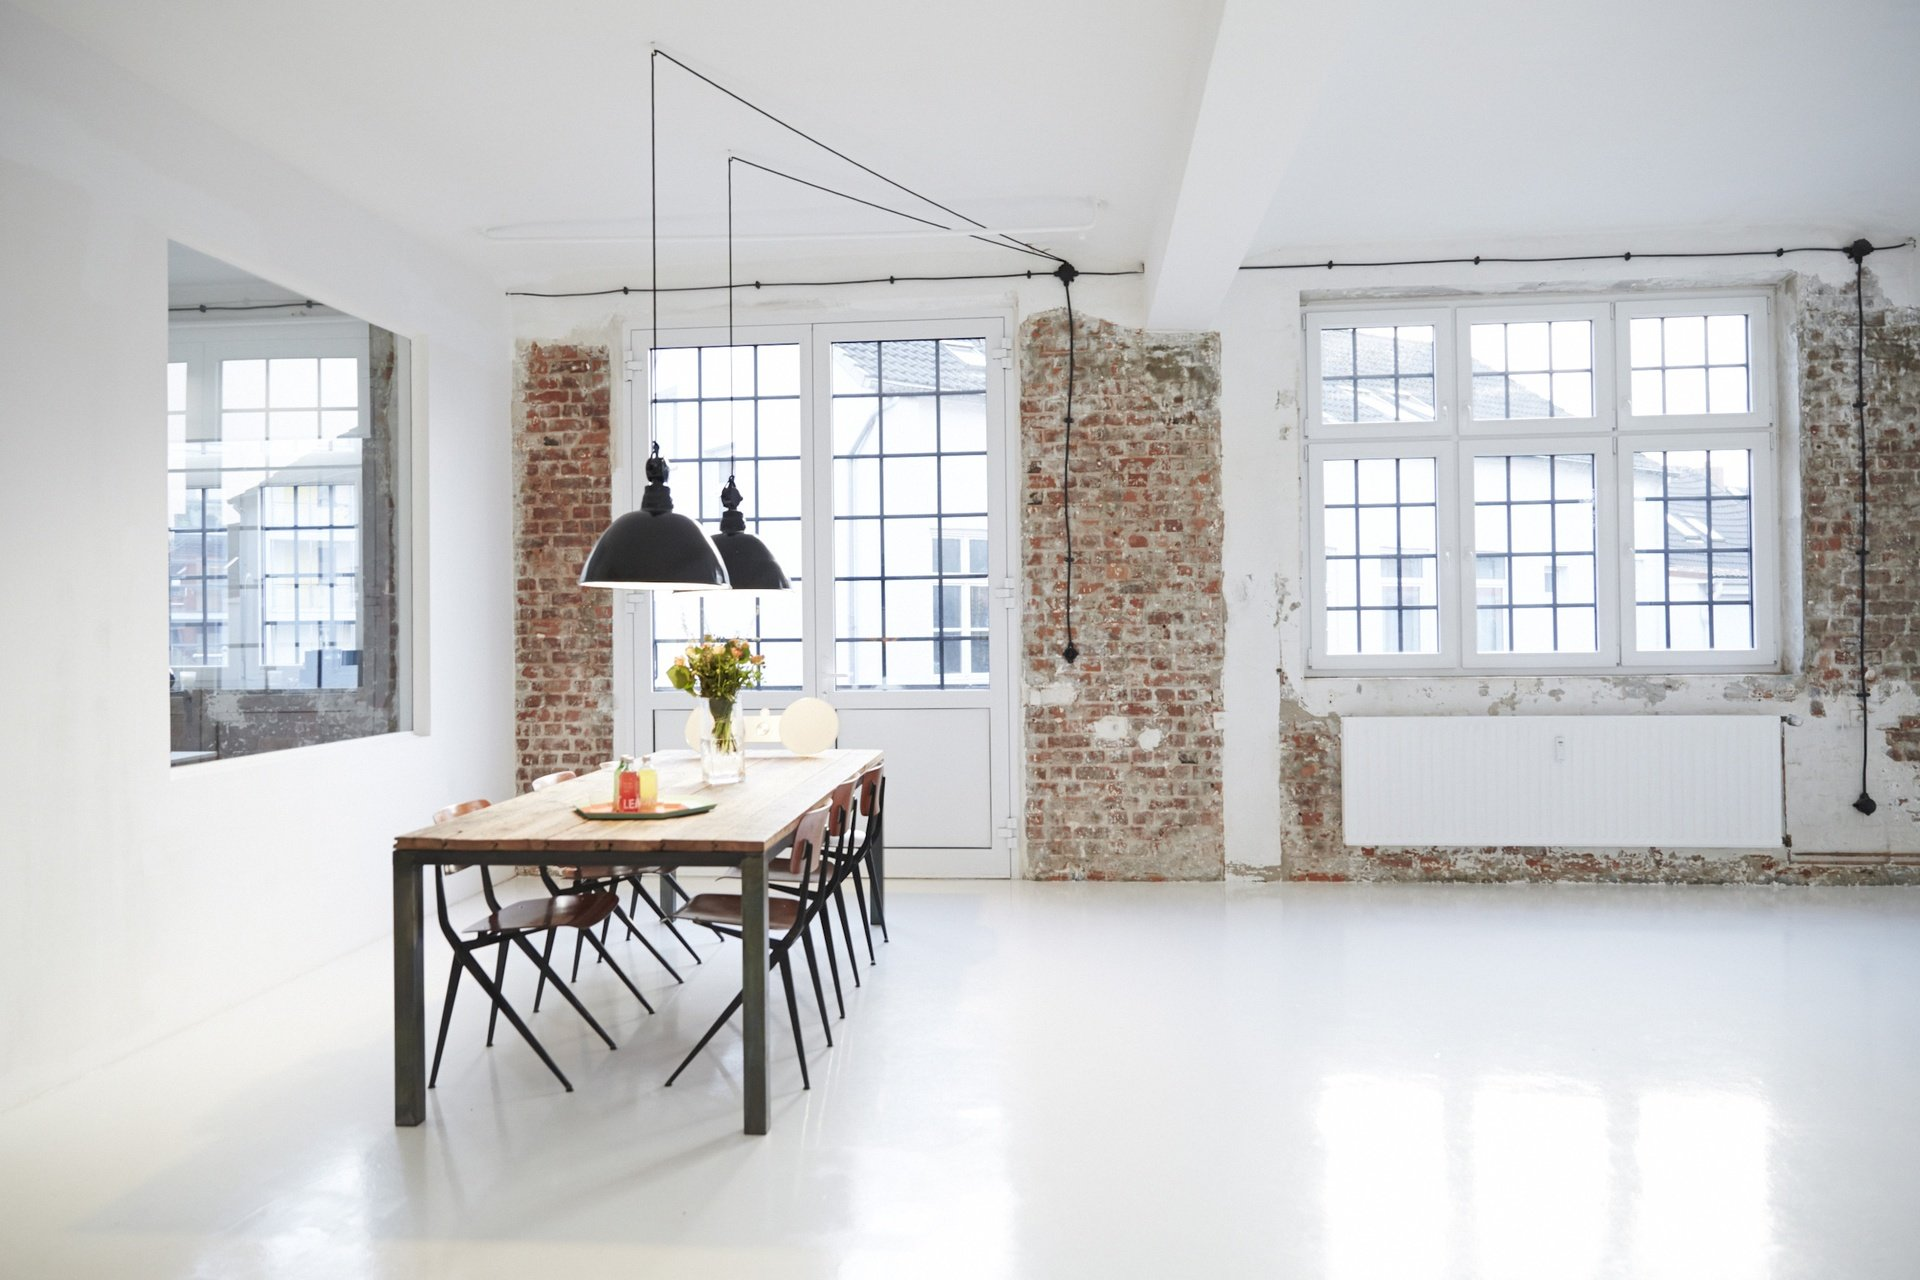 Hamburg workshop spaces Foto Studio Allkinds Studio image 0